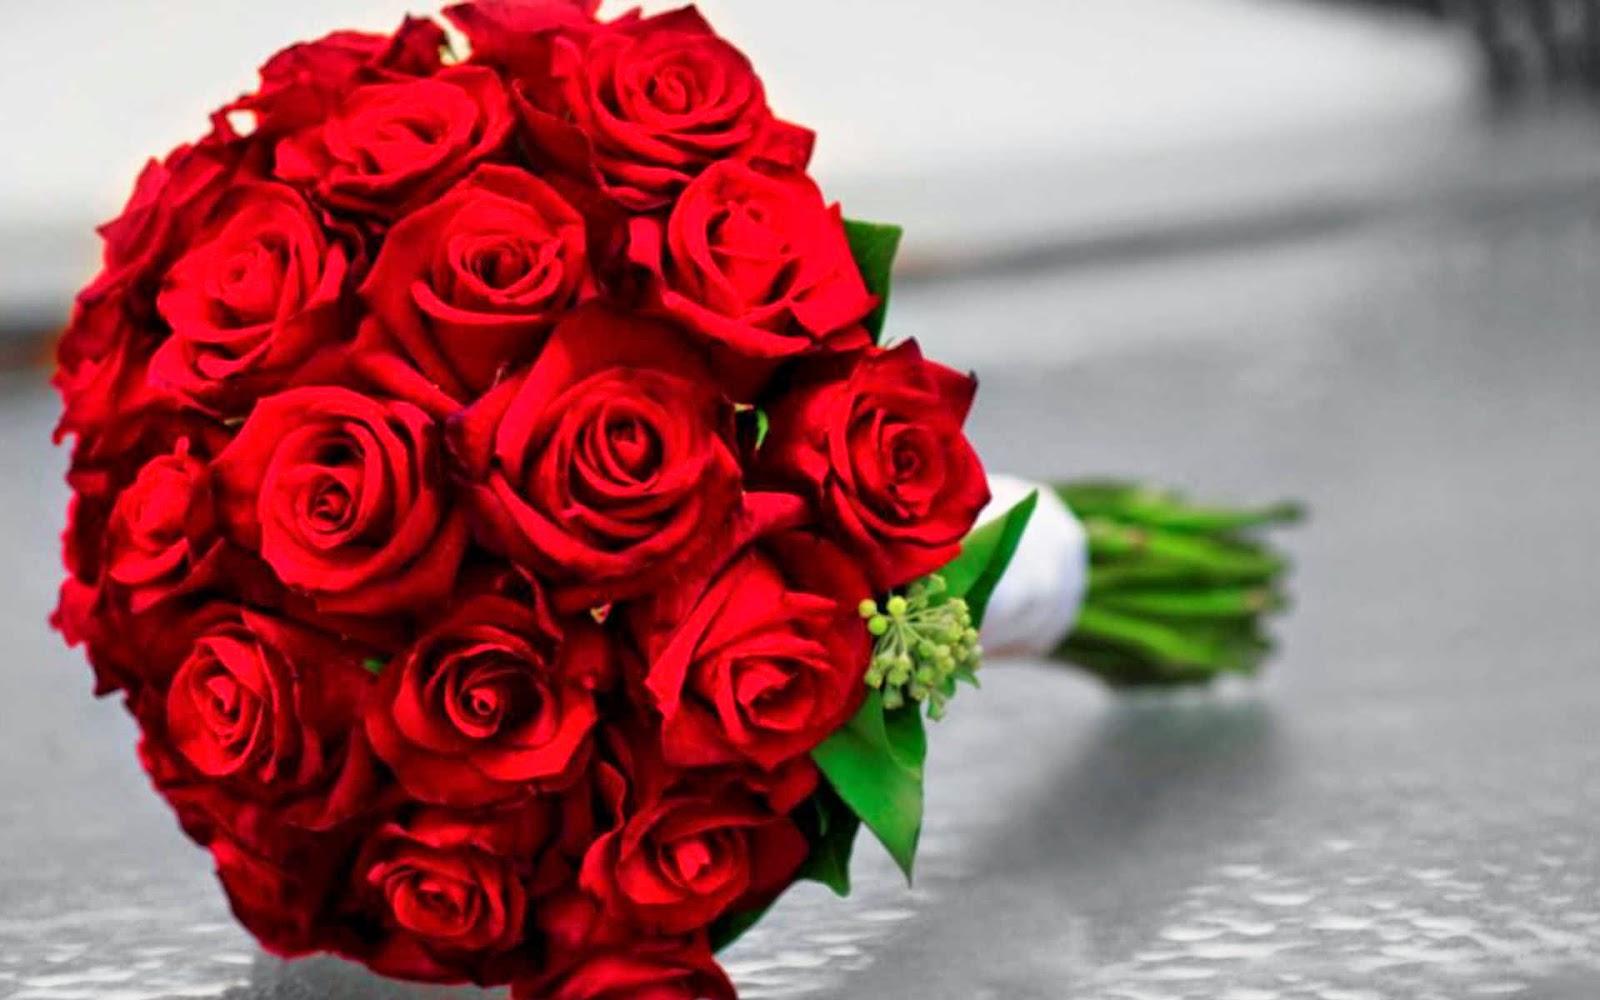 Wedding Bouquet Definition : Red rose wedding bouquet hd wallpapers o wallpaper